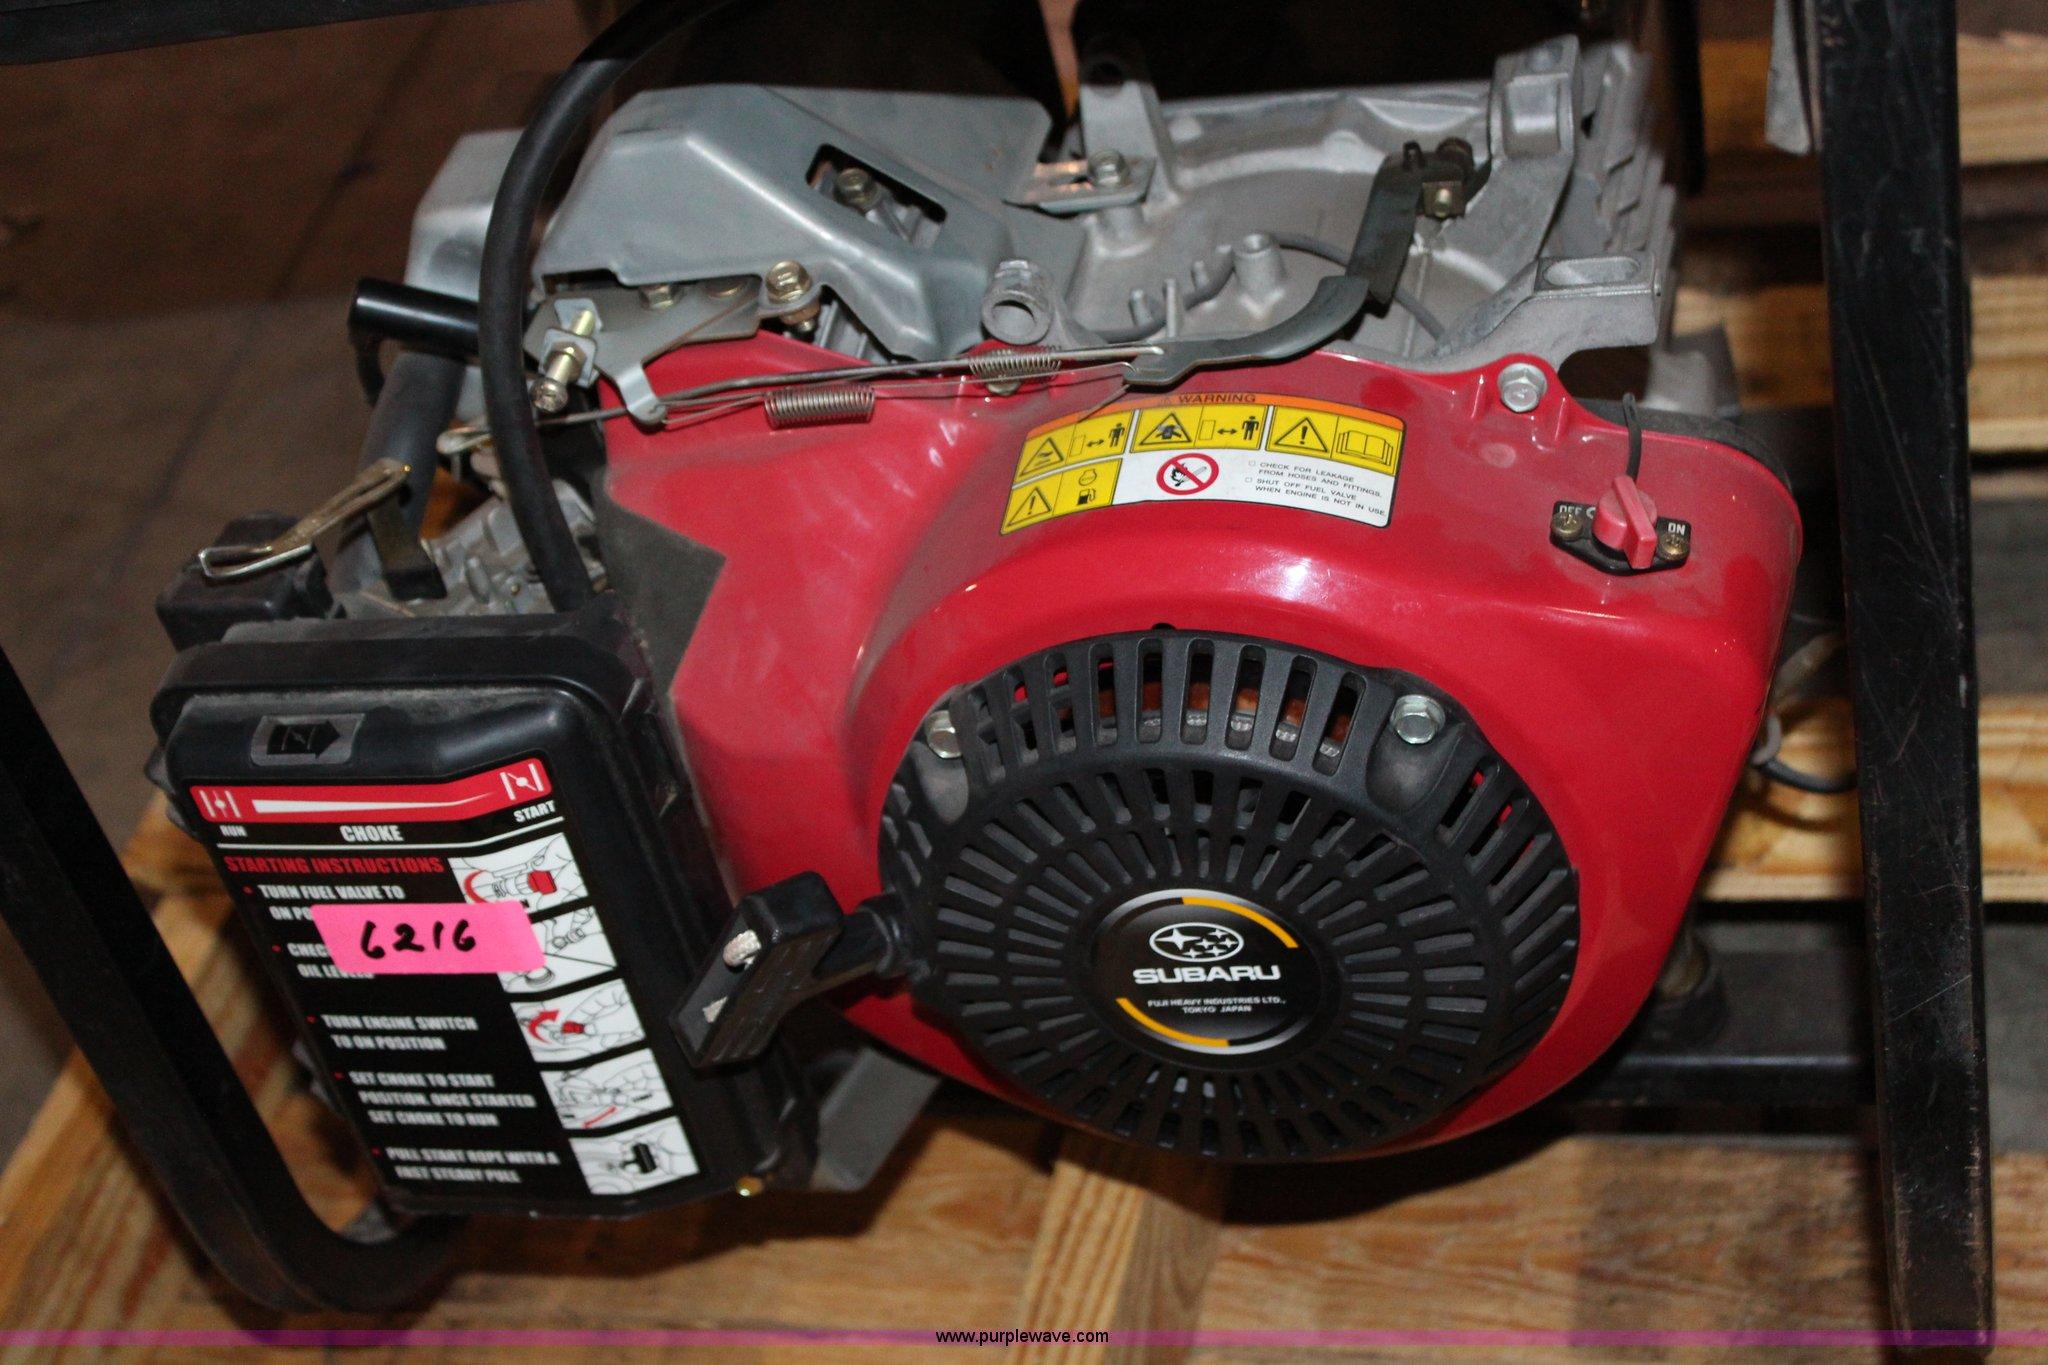 Black Max 6560 Generator Item Aj9738 4 30 2013